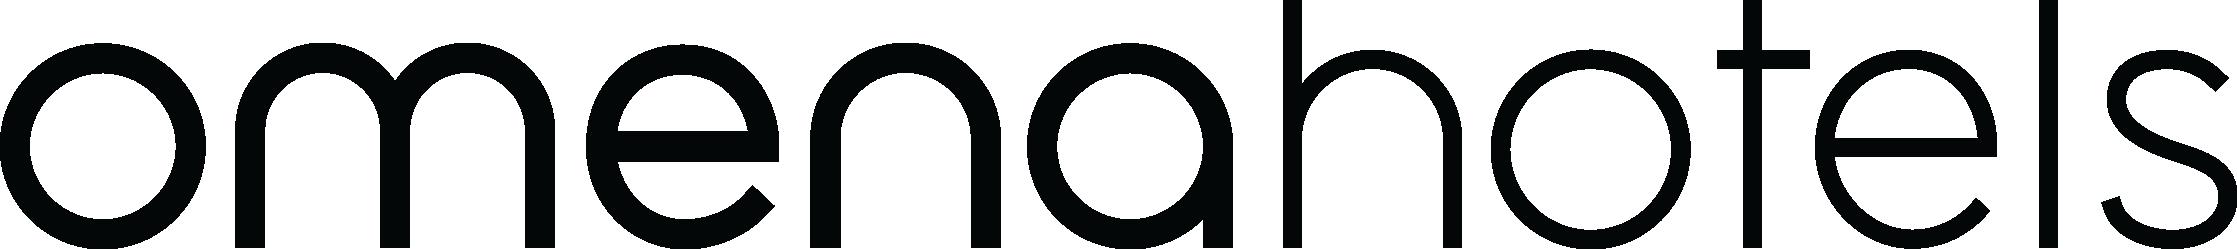 omenahotels-logo